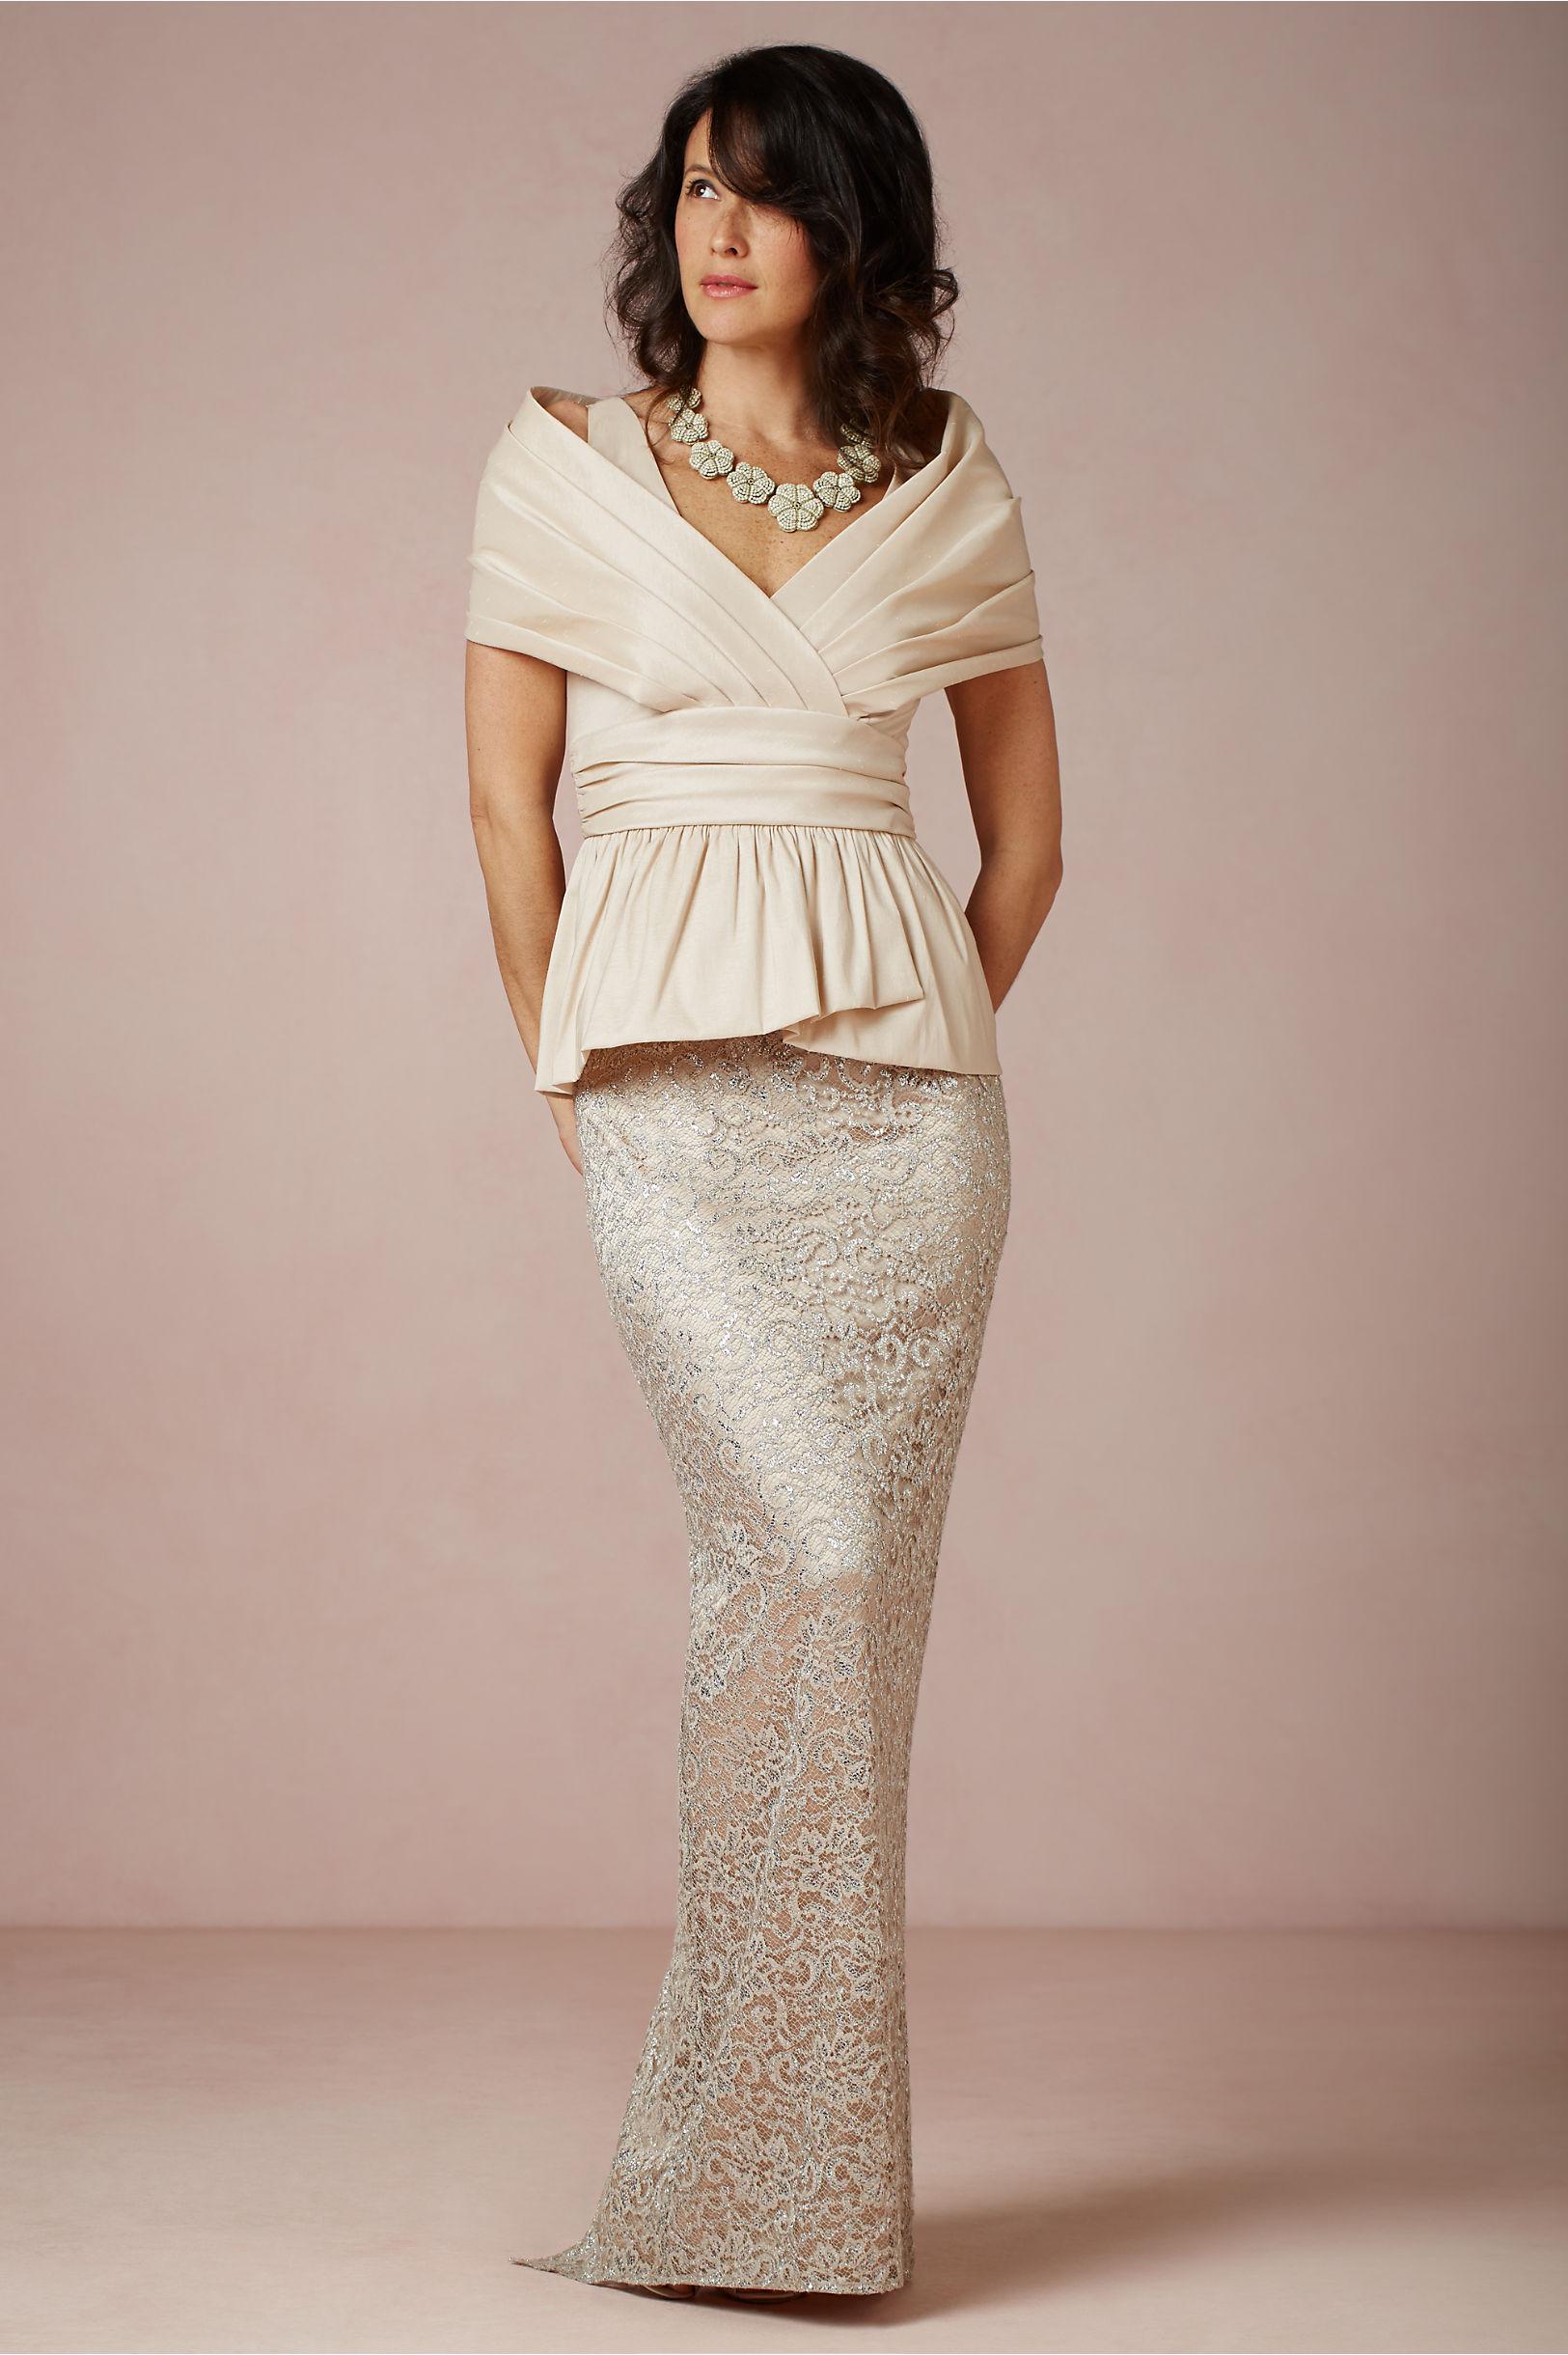 Mila Dress in Sale | BHLDN